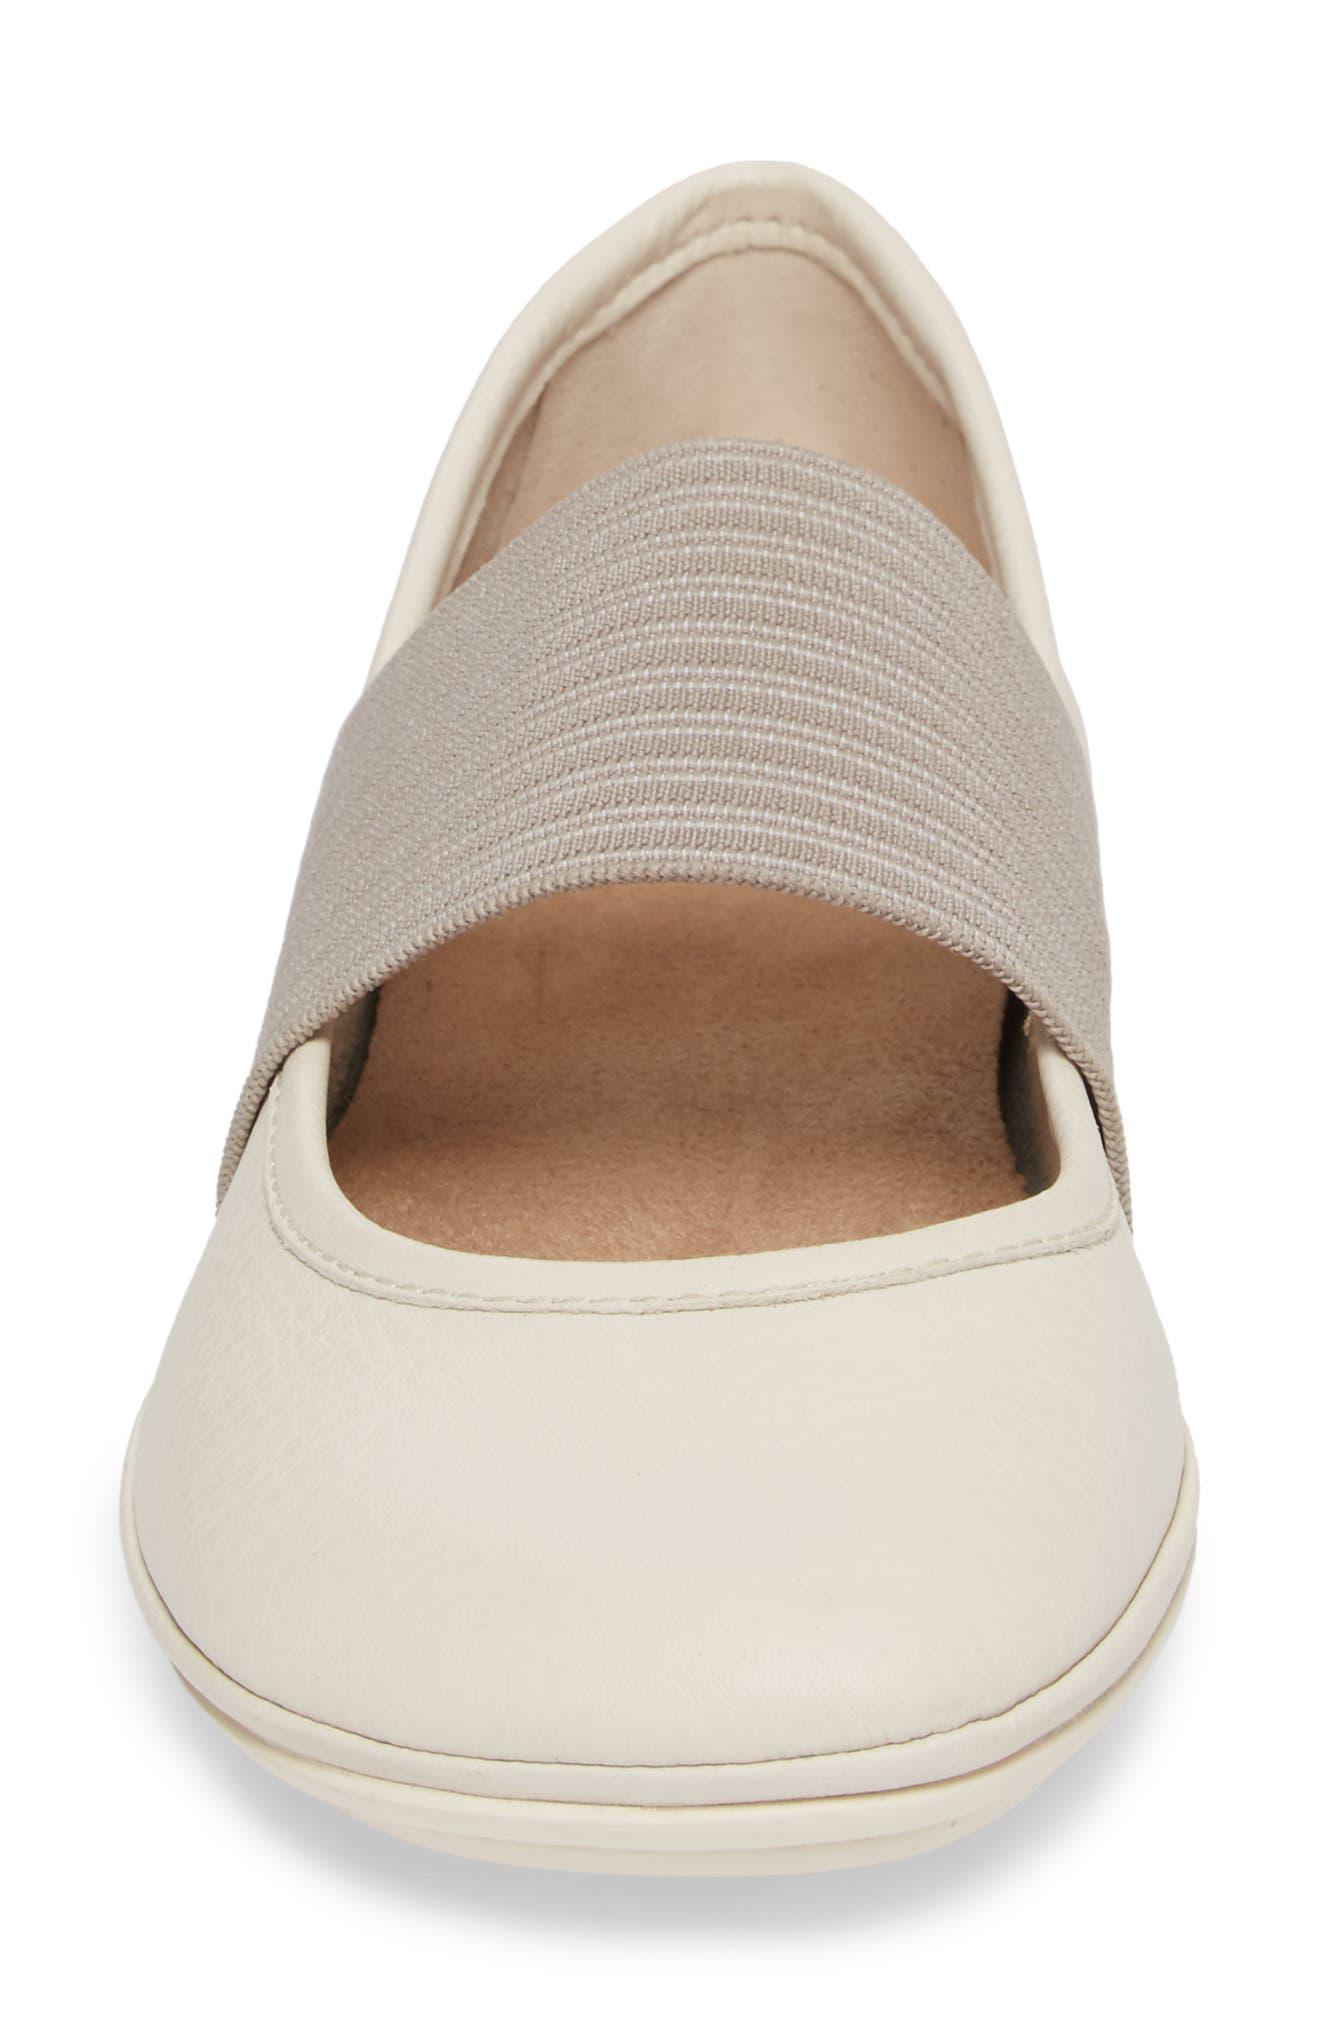 'Right Nina' Leather Ballerina Flat,                             Alternate thumbnail 4, color,                             Light Beige Leather